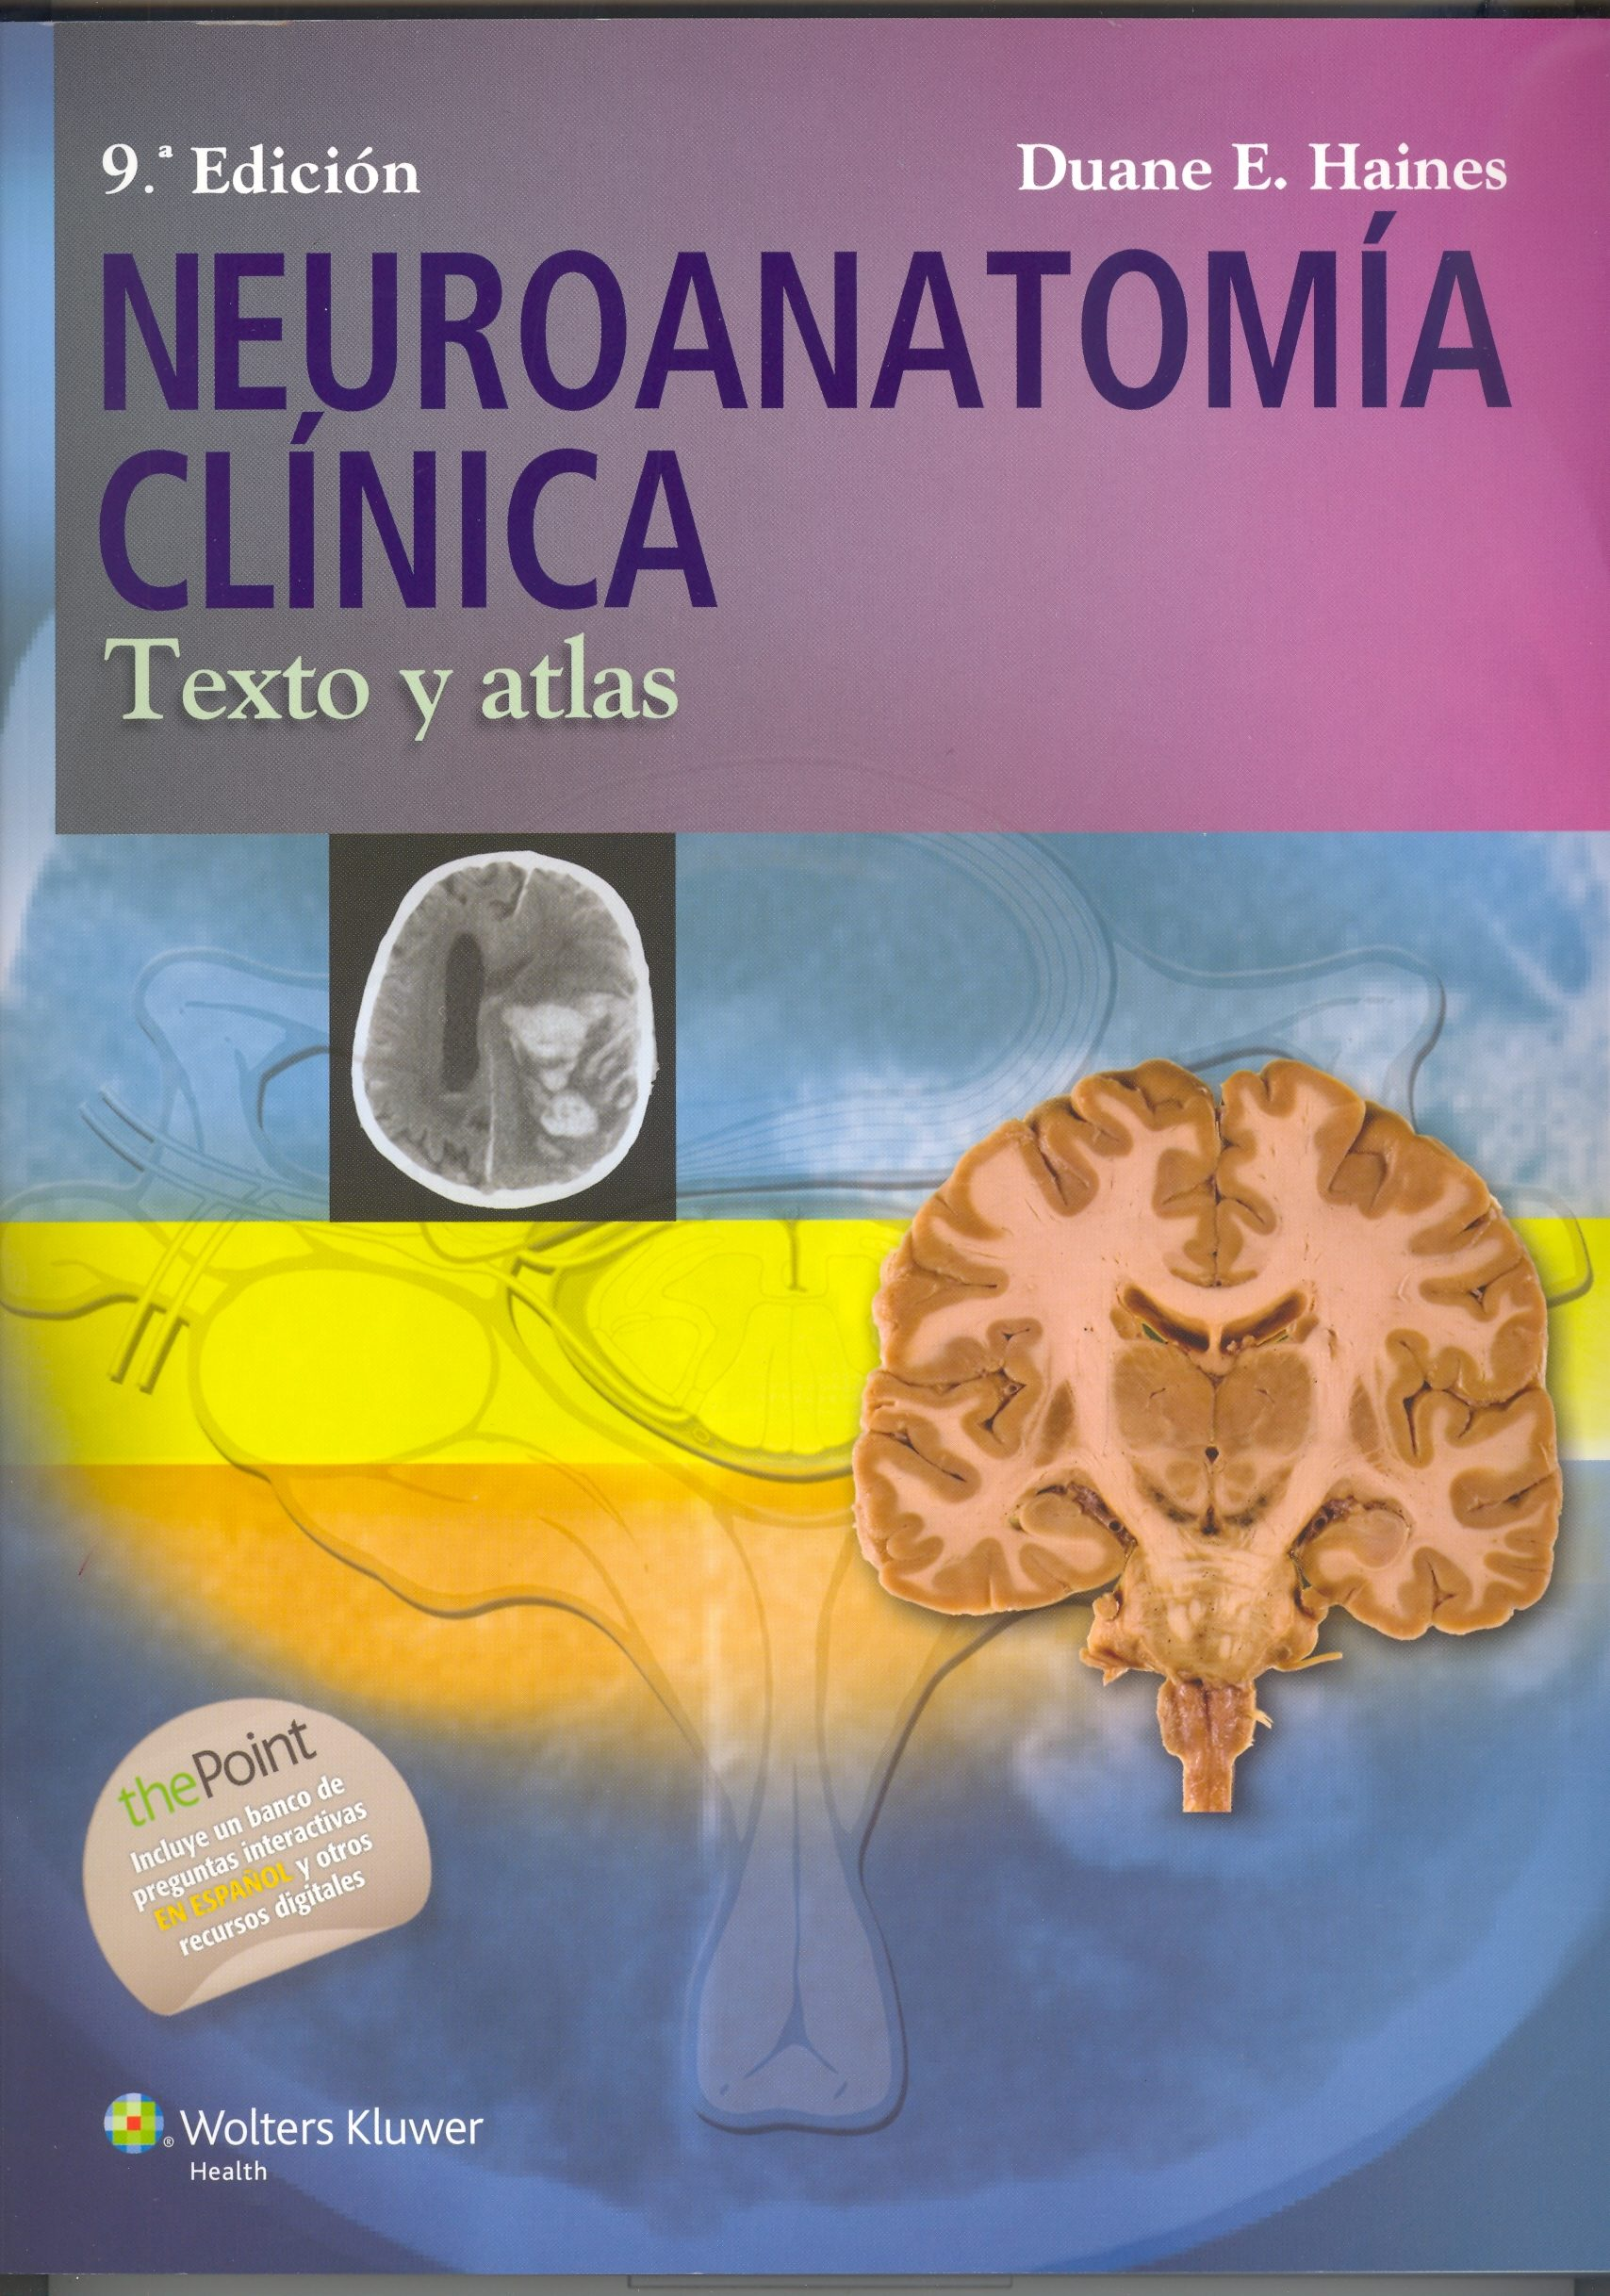 NEUROANATOMIA CLINICA: TEXTO Y ATLAS (9ª ED.)   DUANE E. HAINES ...